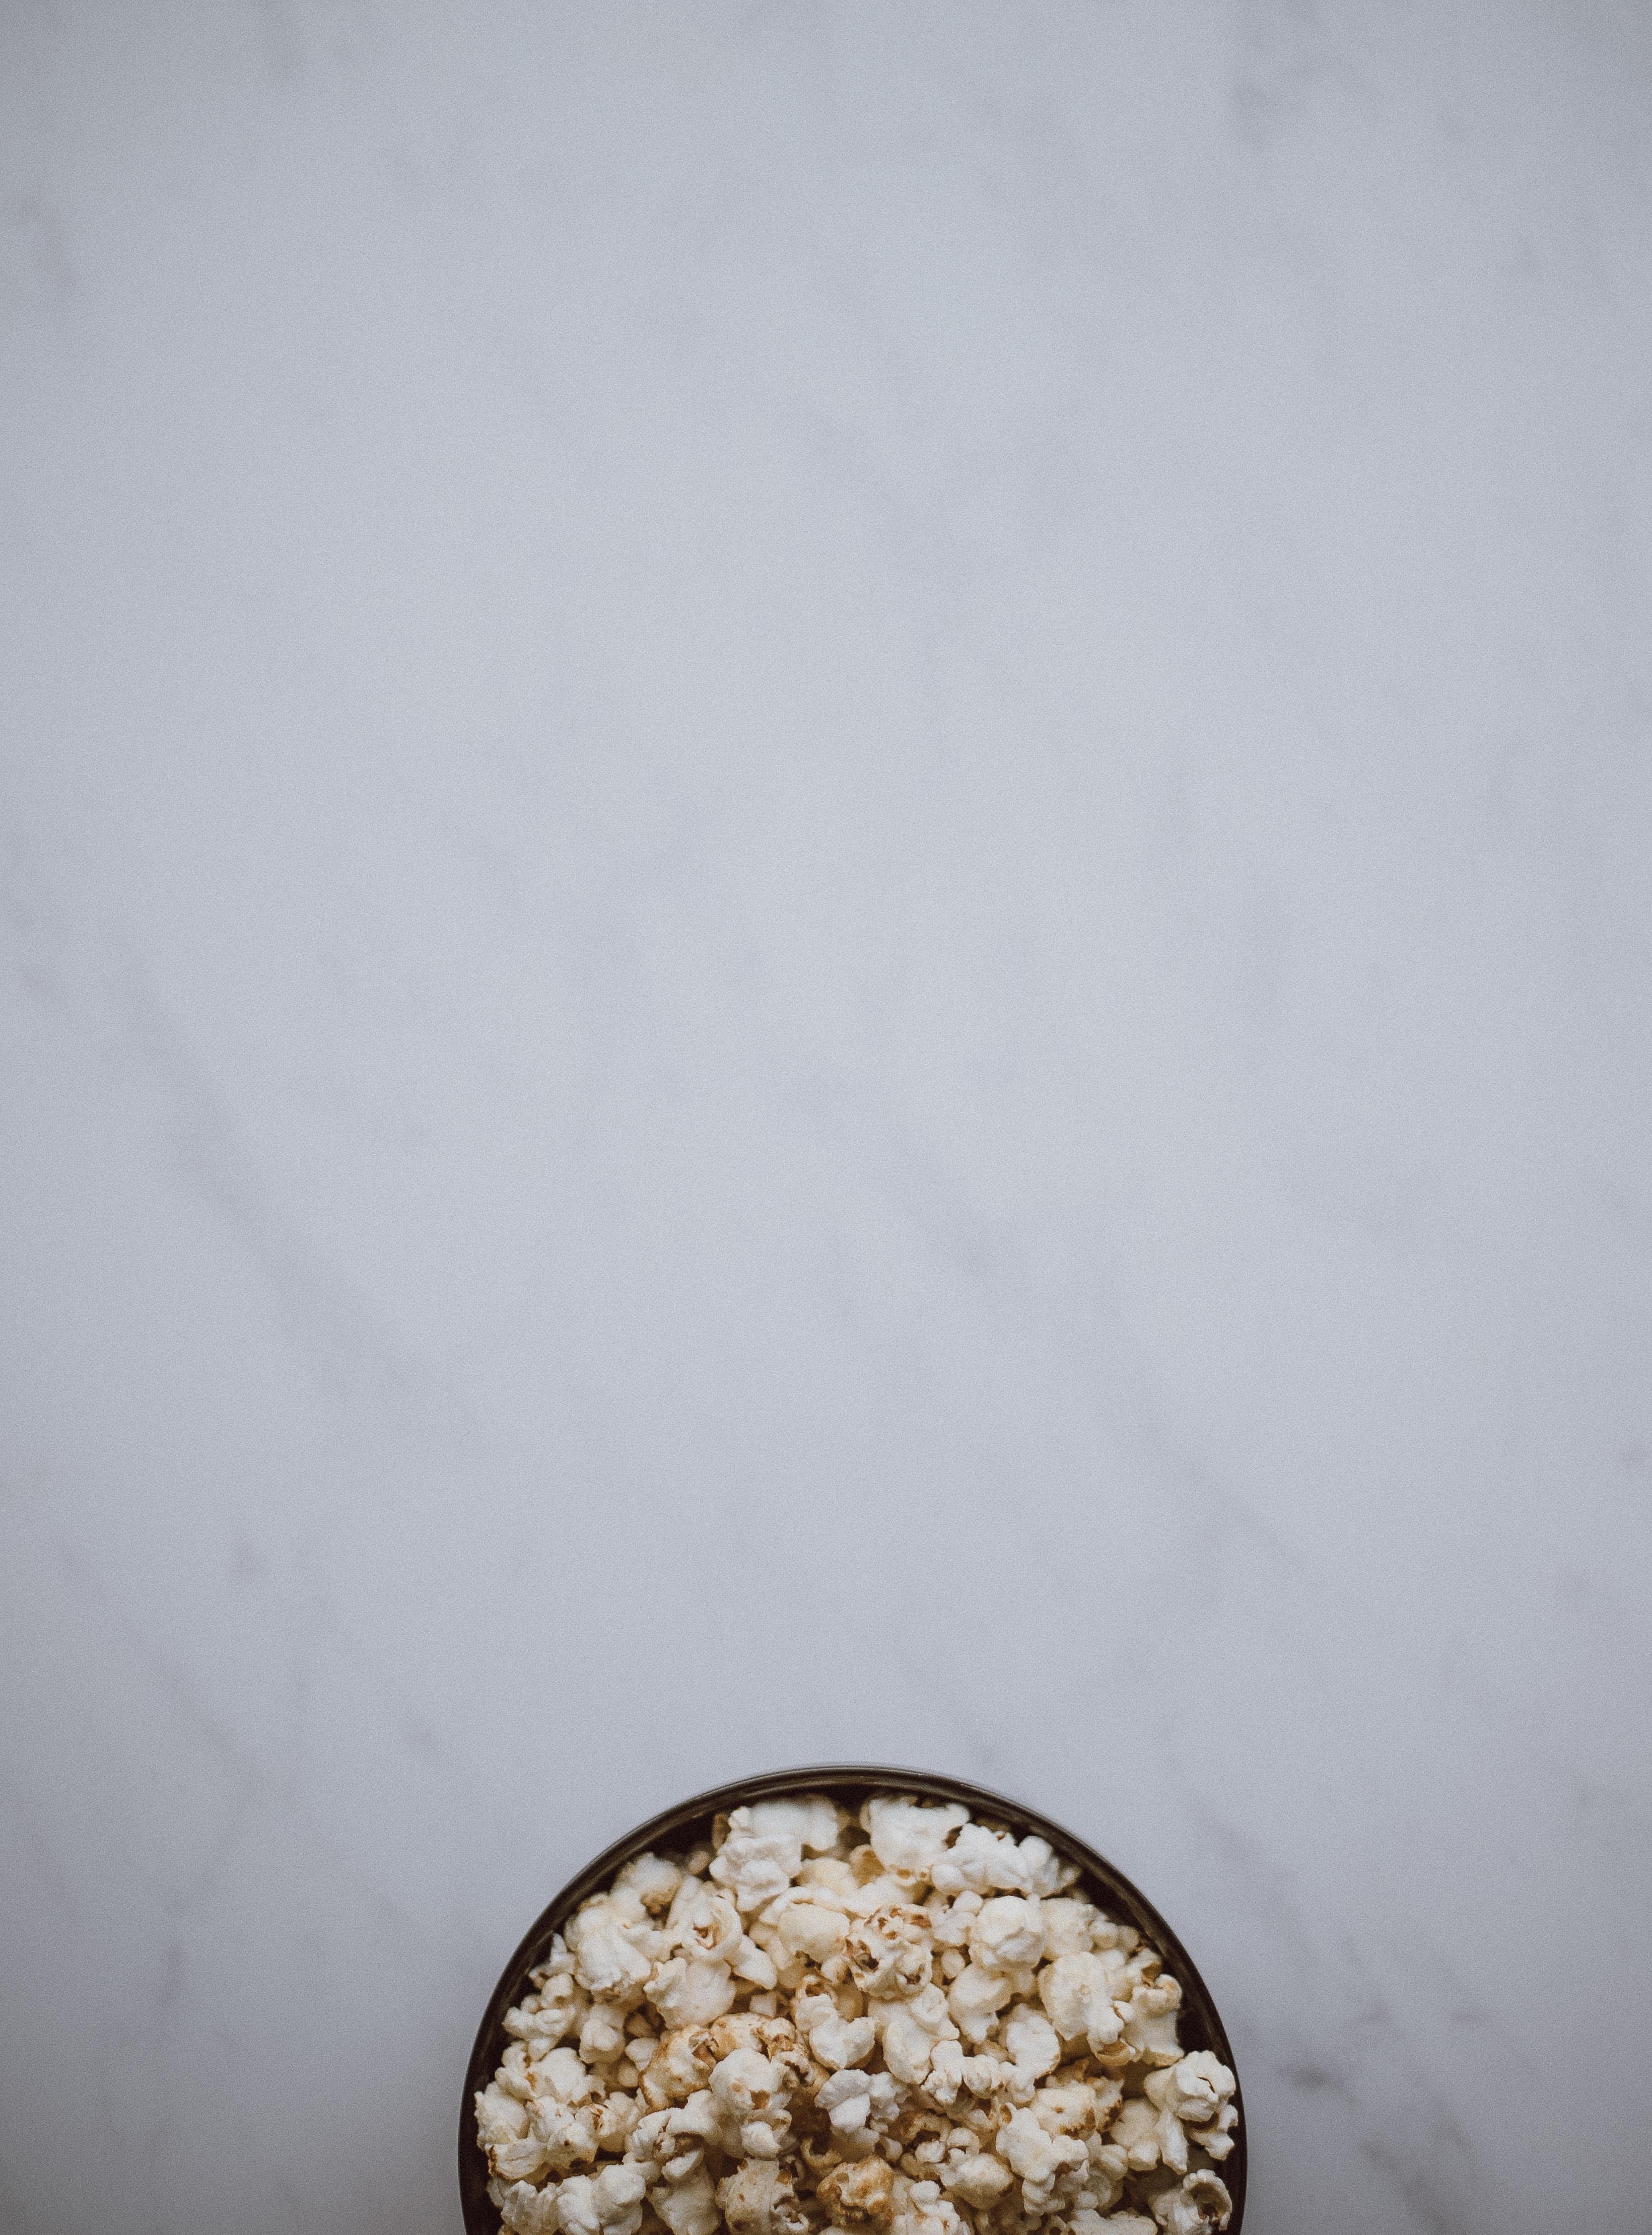 bowl of popcorn on white surface